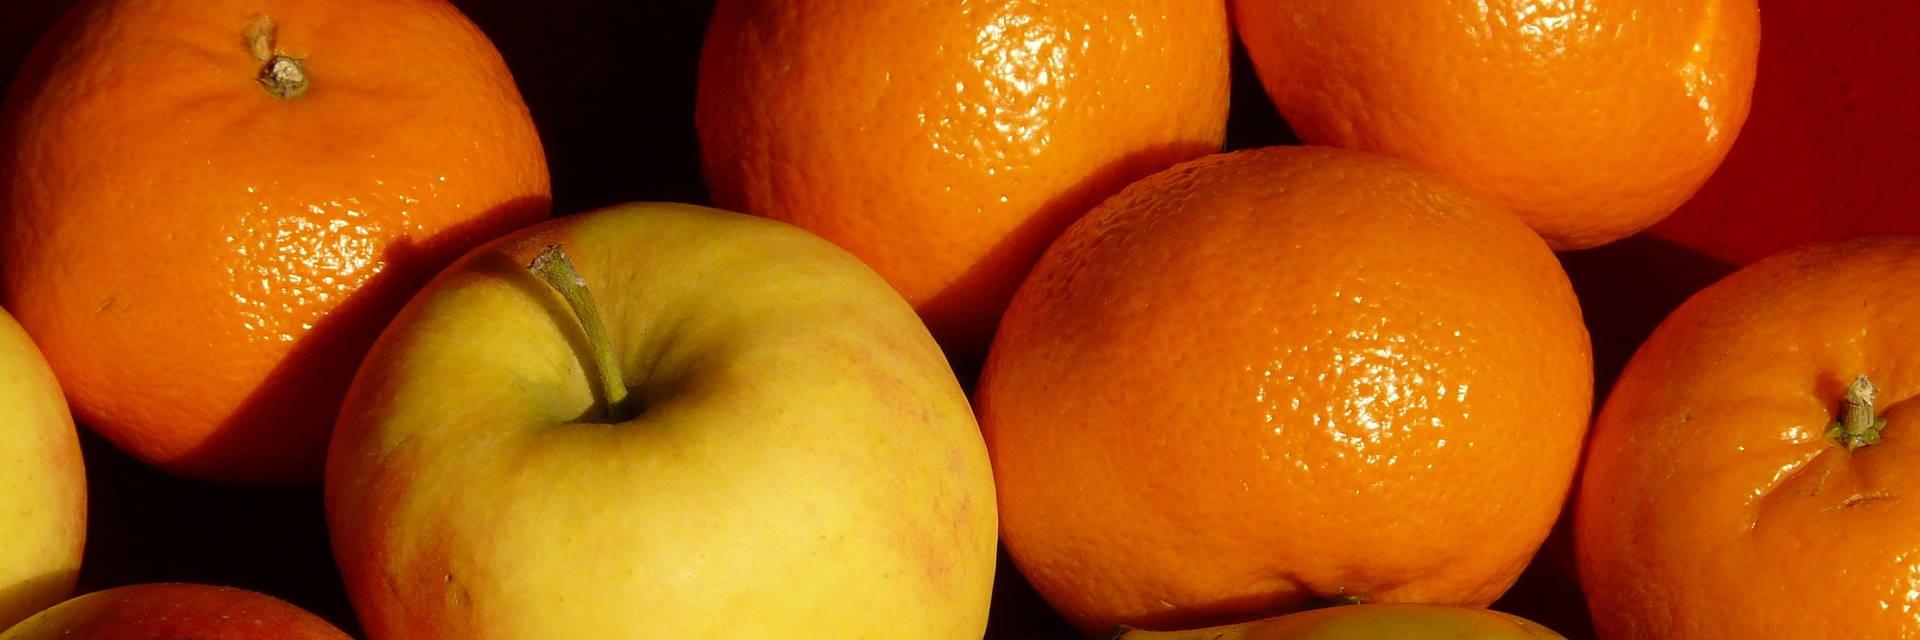 Mandarinen und Äpfel